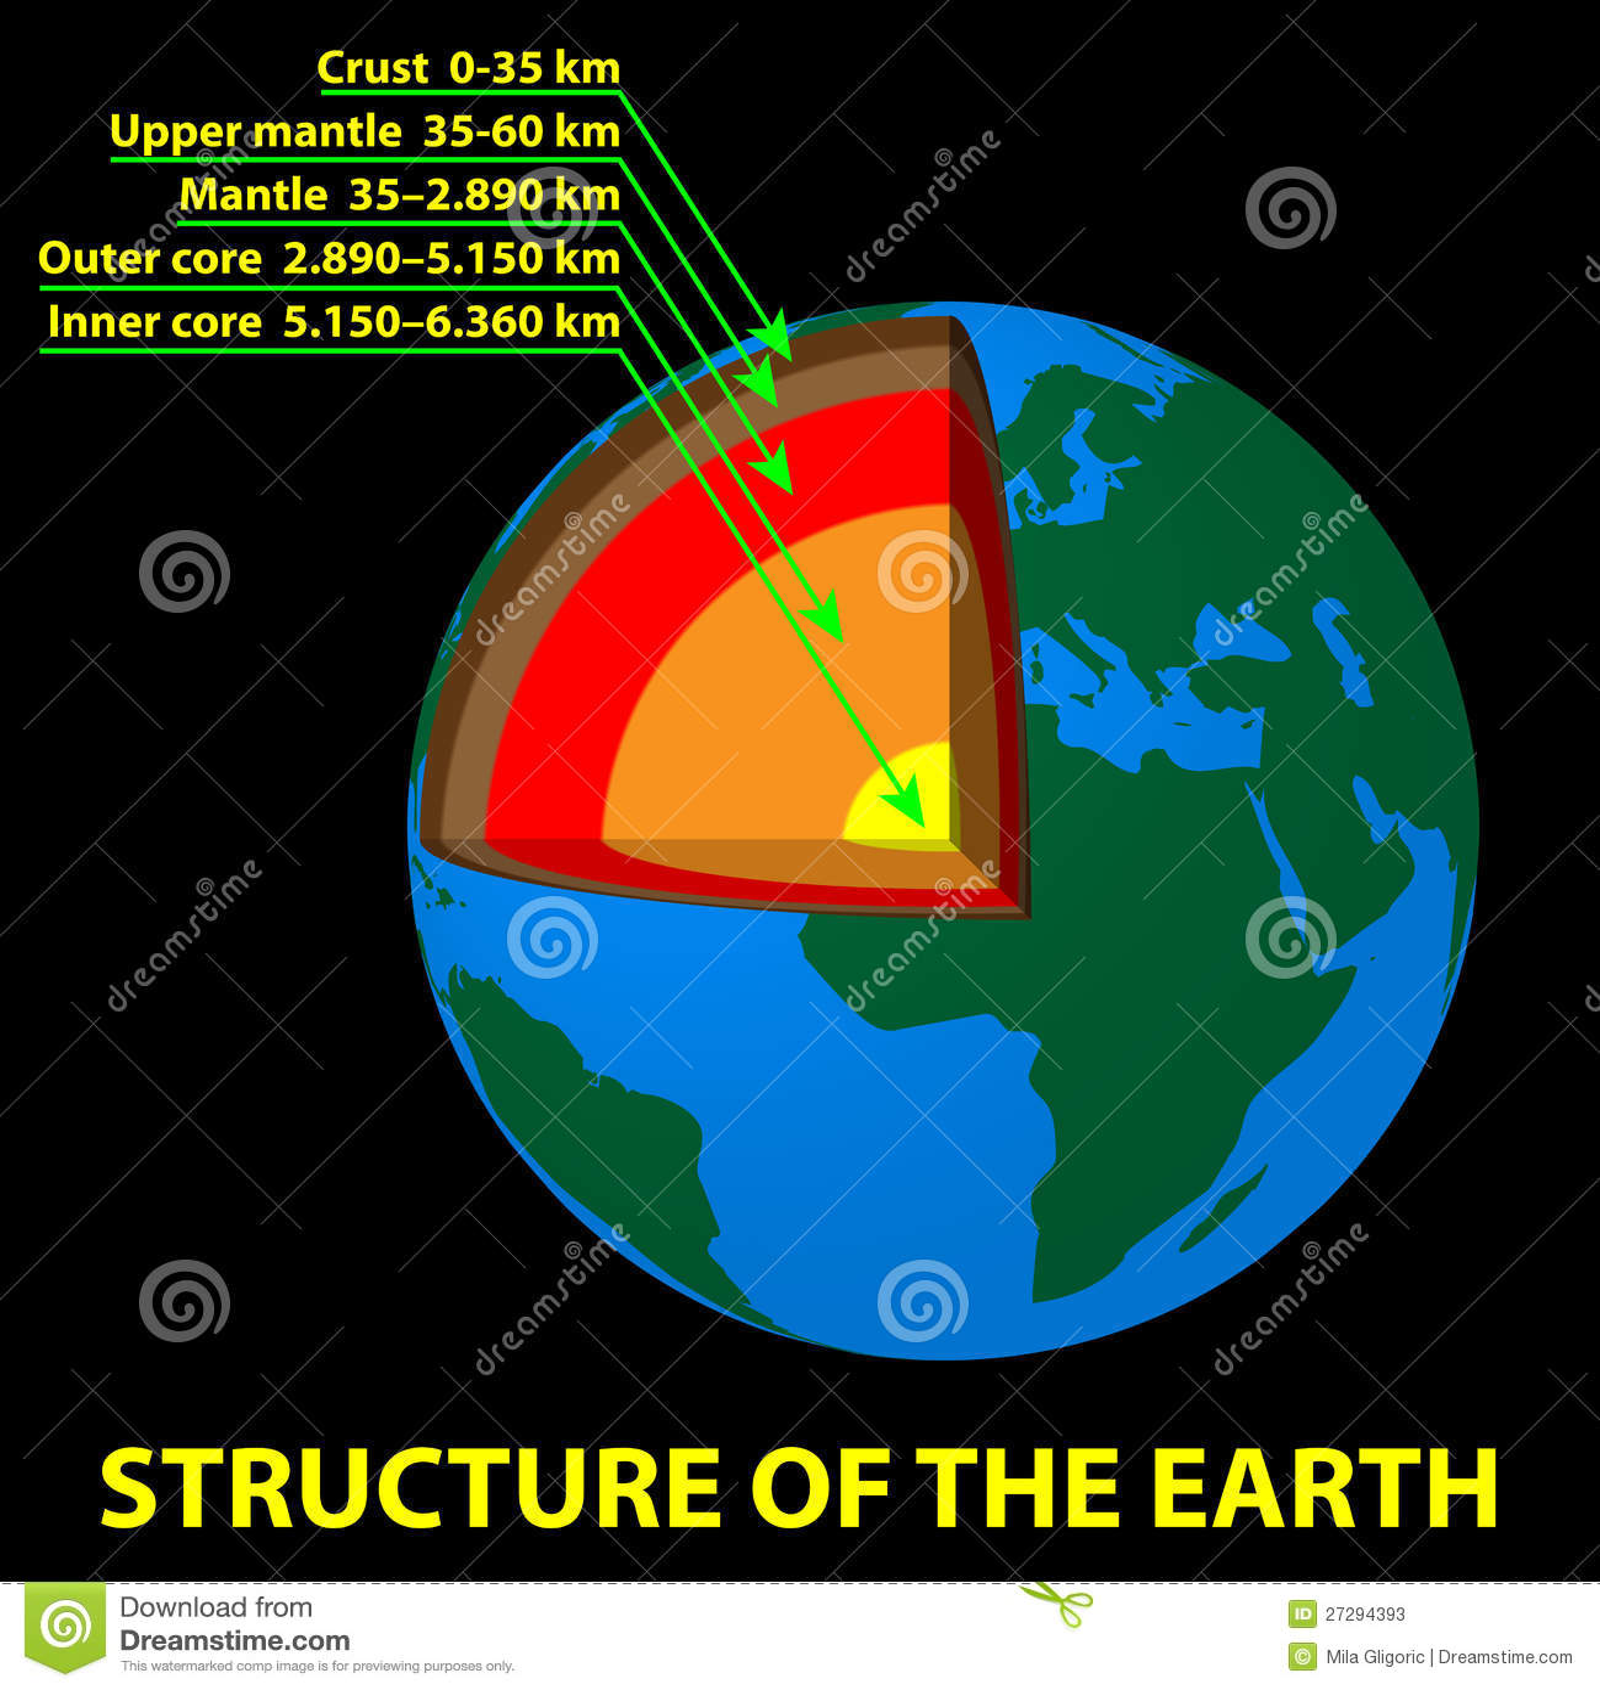 structure of the earth diagram garage door opener wiring stock vector illustration outdoors 27294393 core crust mantle